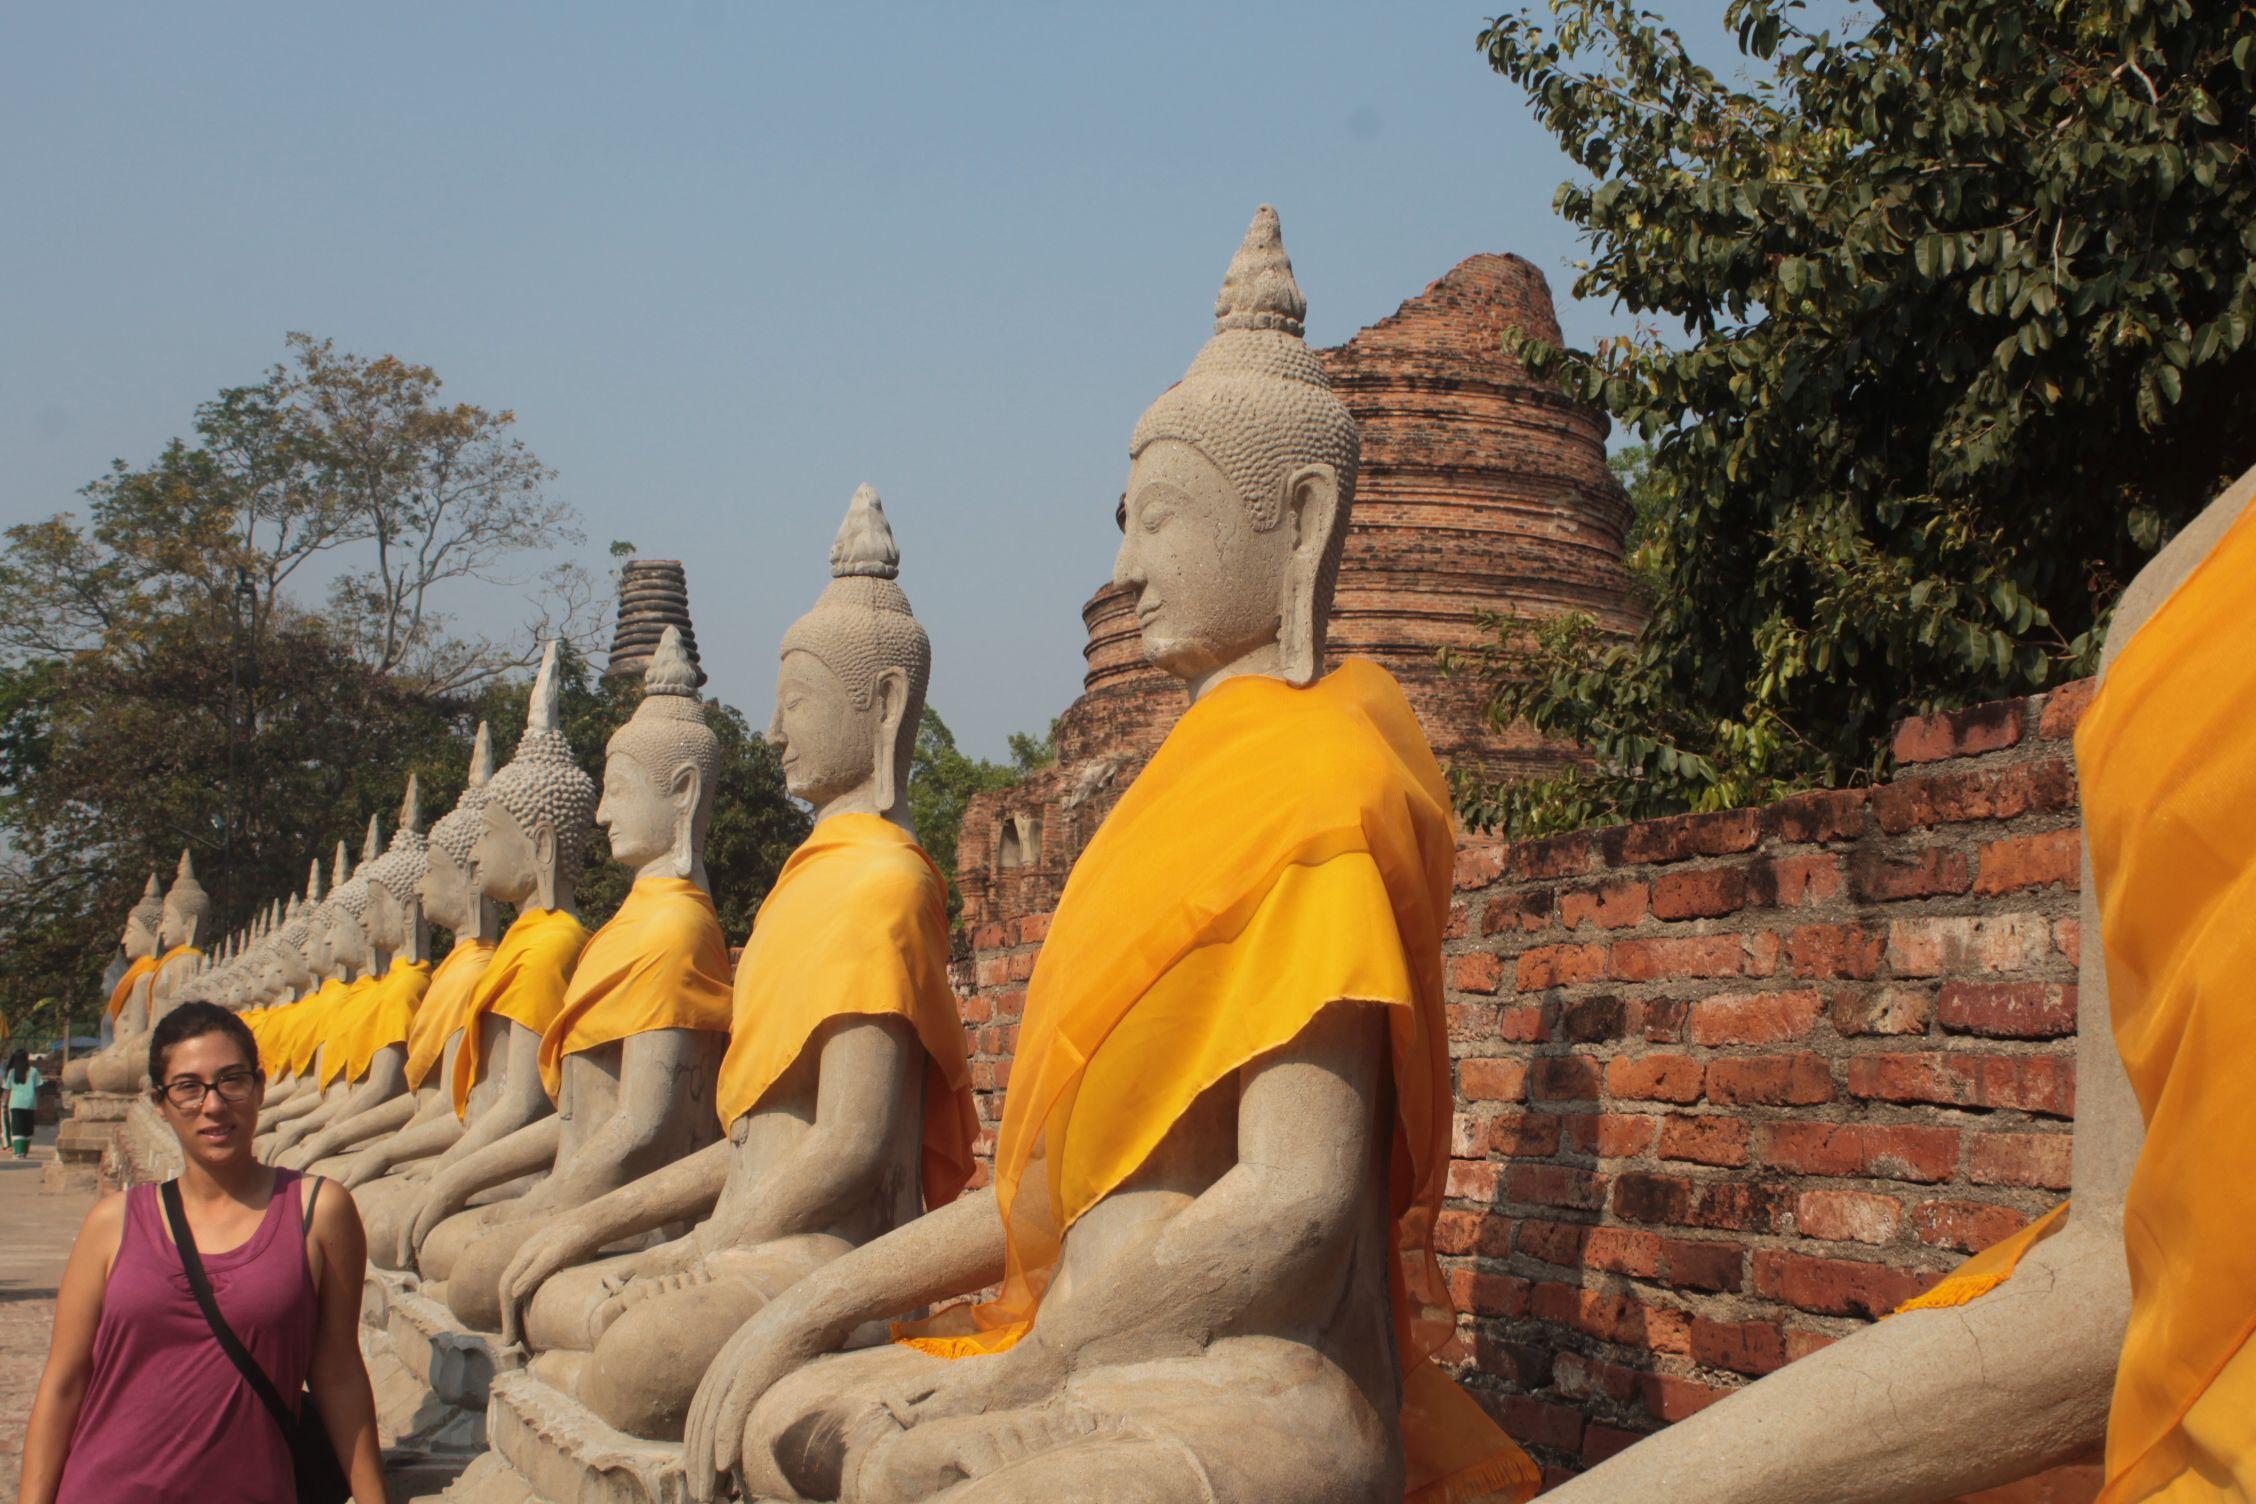 Tipica estampa de Wat Yai Chai Mongkhon